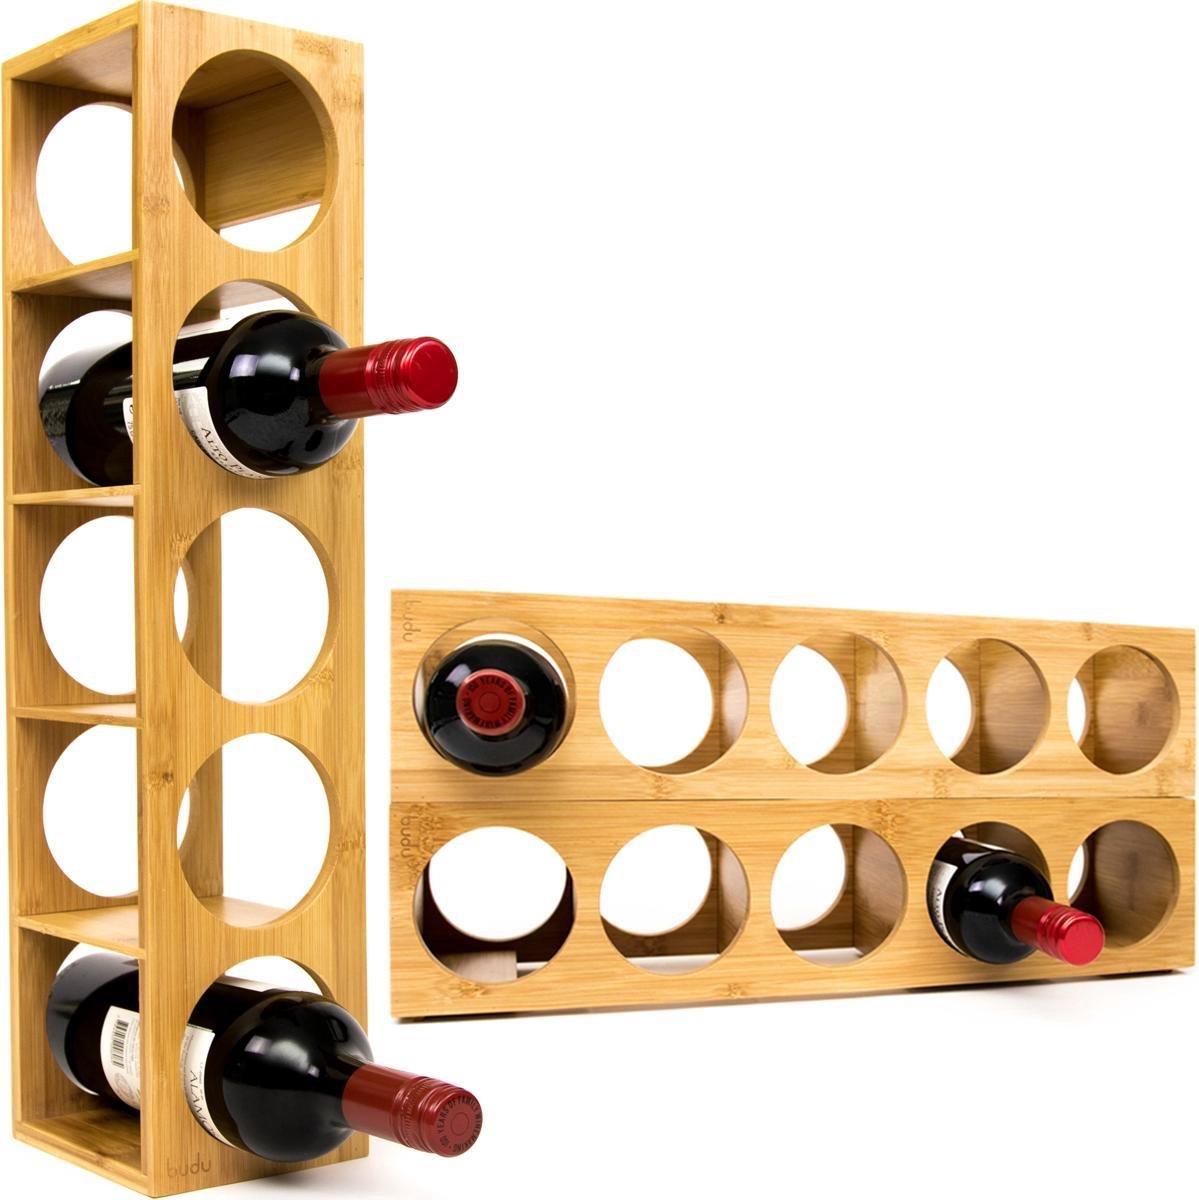 Budu Wijnrek Bamboe 5 flessen - Wijnrek hout - Stapelbaar - Uitbreidbaar - Houten wijnrek - Flessenrek - Bamboe wijnrekken - Wijnrek staand - Wijnfleshouder